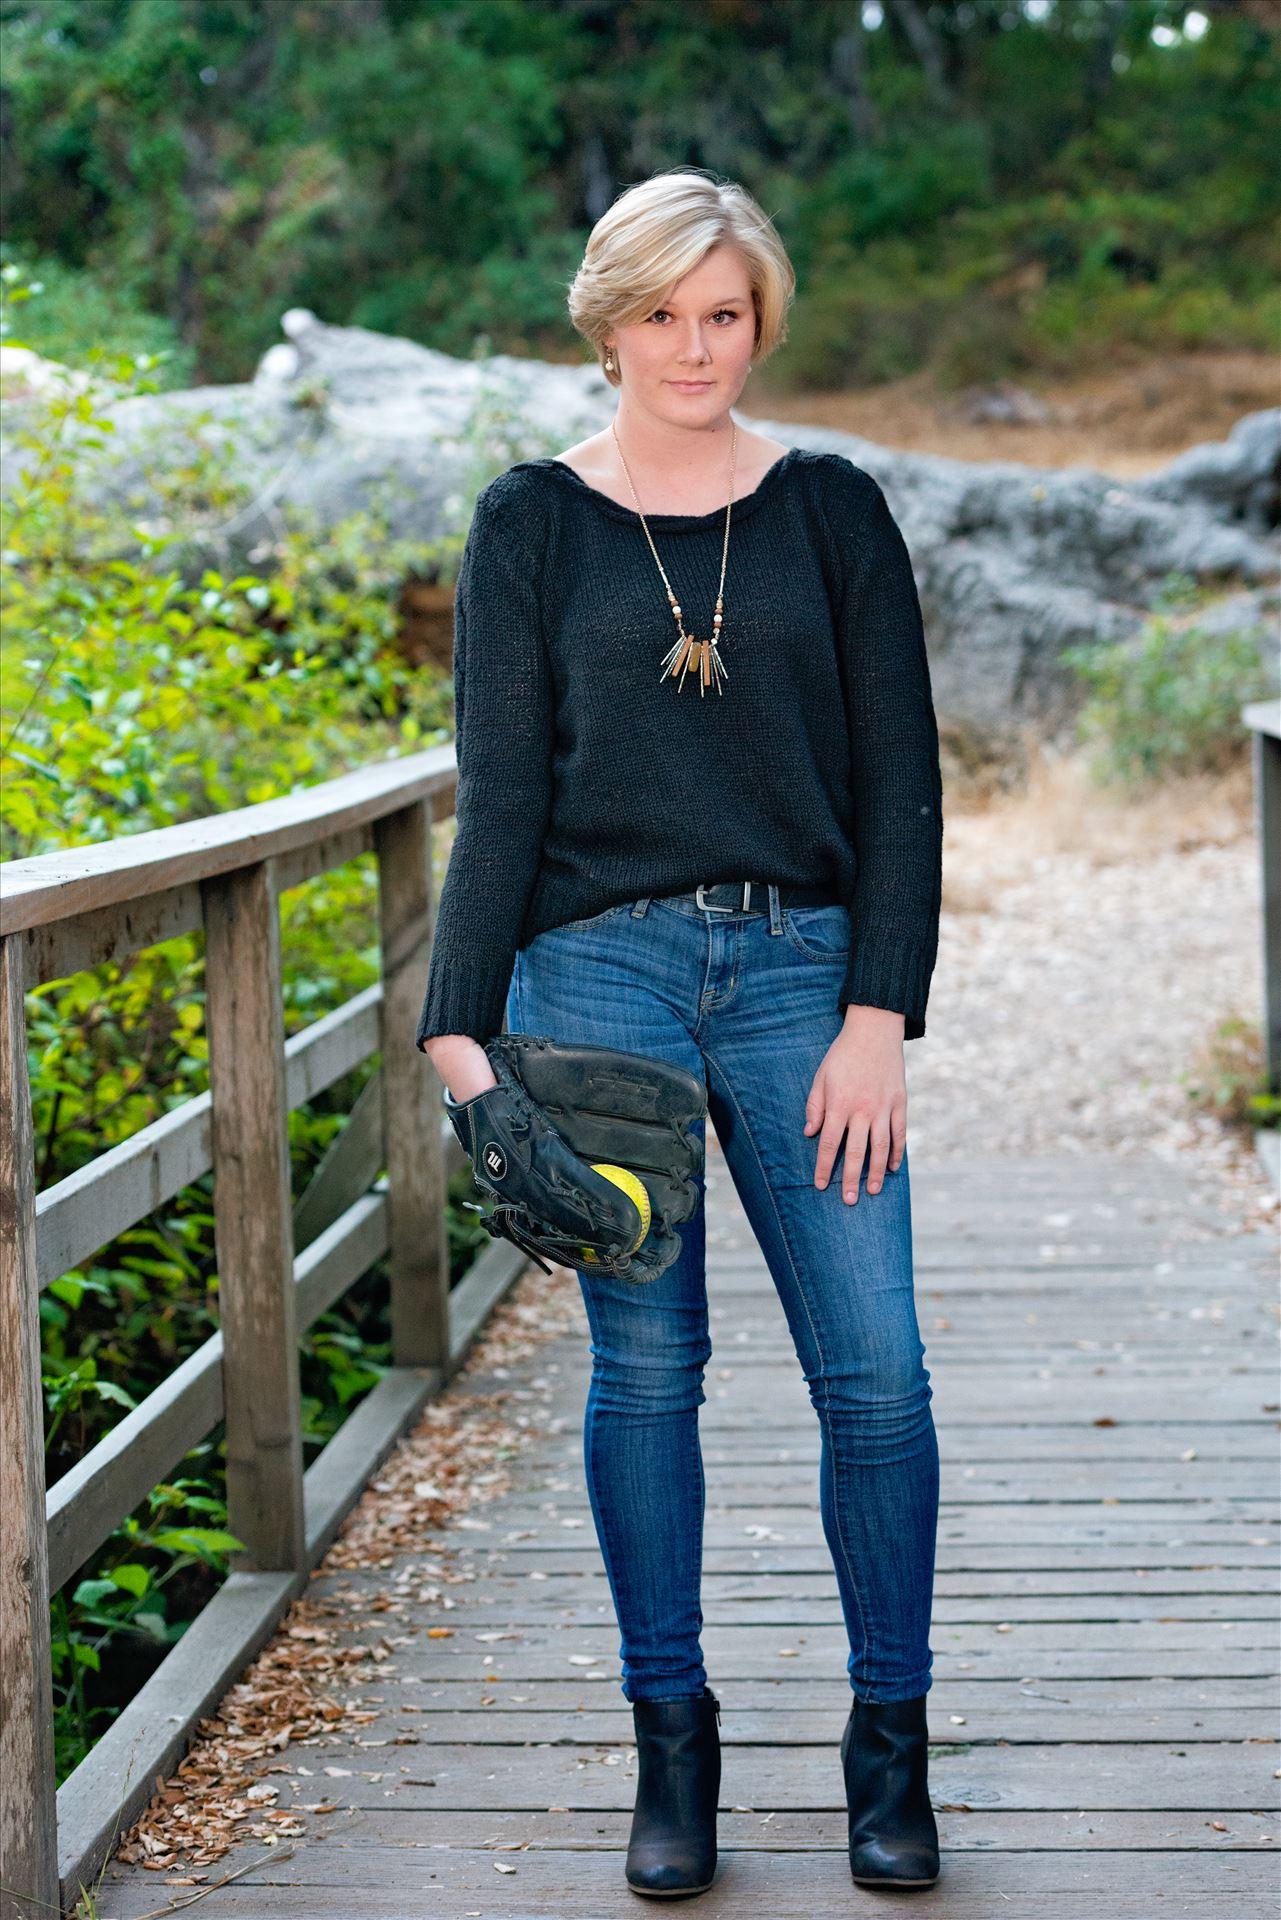 Ariel Ingram Senior Portraits 26 Senior Portrait Session 2018 at Los Osos Oaks Reserve.  San Luis Obispo and Central Coast Senior Portrait photographer Mirror's Edge Photography. Senior on bridge with softball prop by Sarah Williams